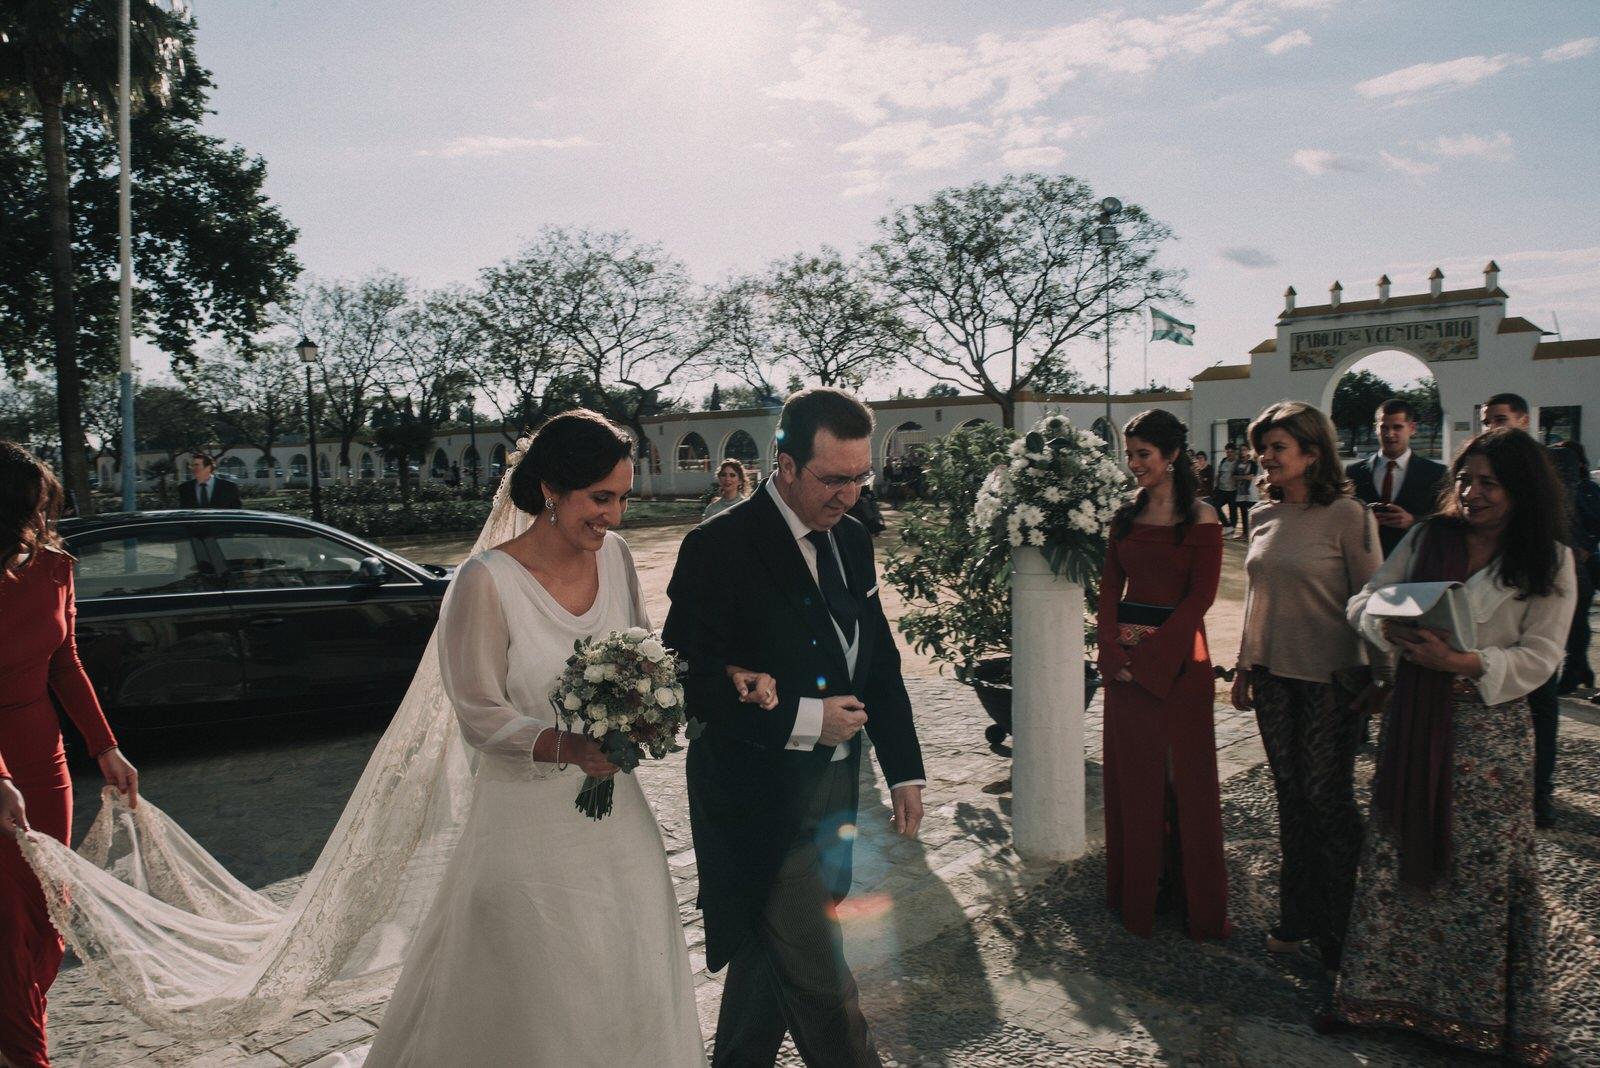 fotografo de bodas sevilla - fotografo boda - fotografía sevilla - Andrés AmarilloAAA_2951- fine.JPG